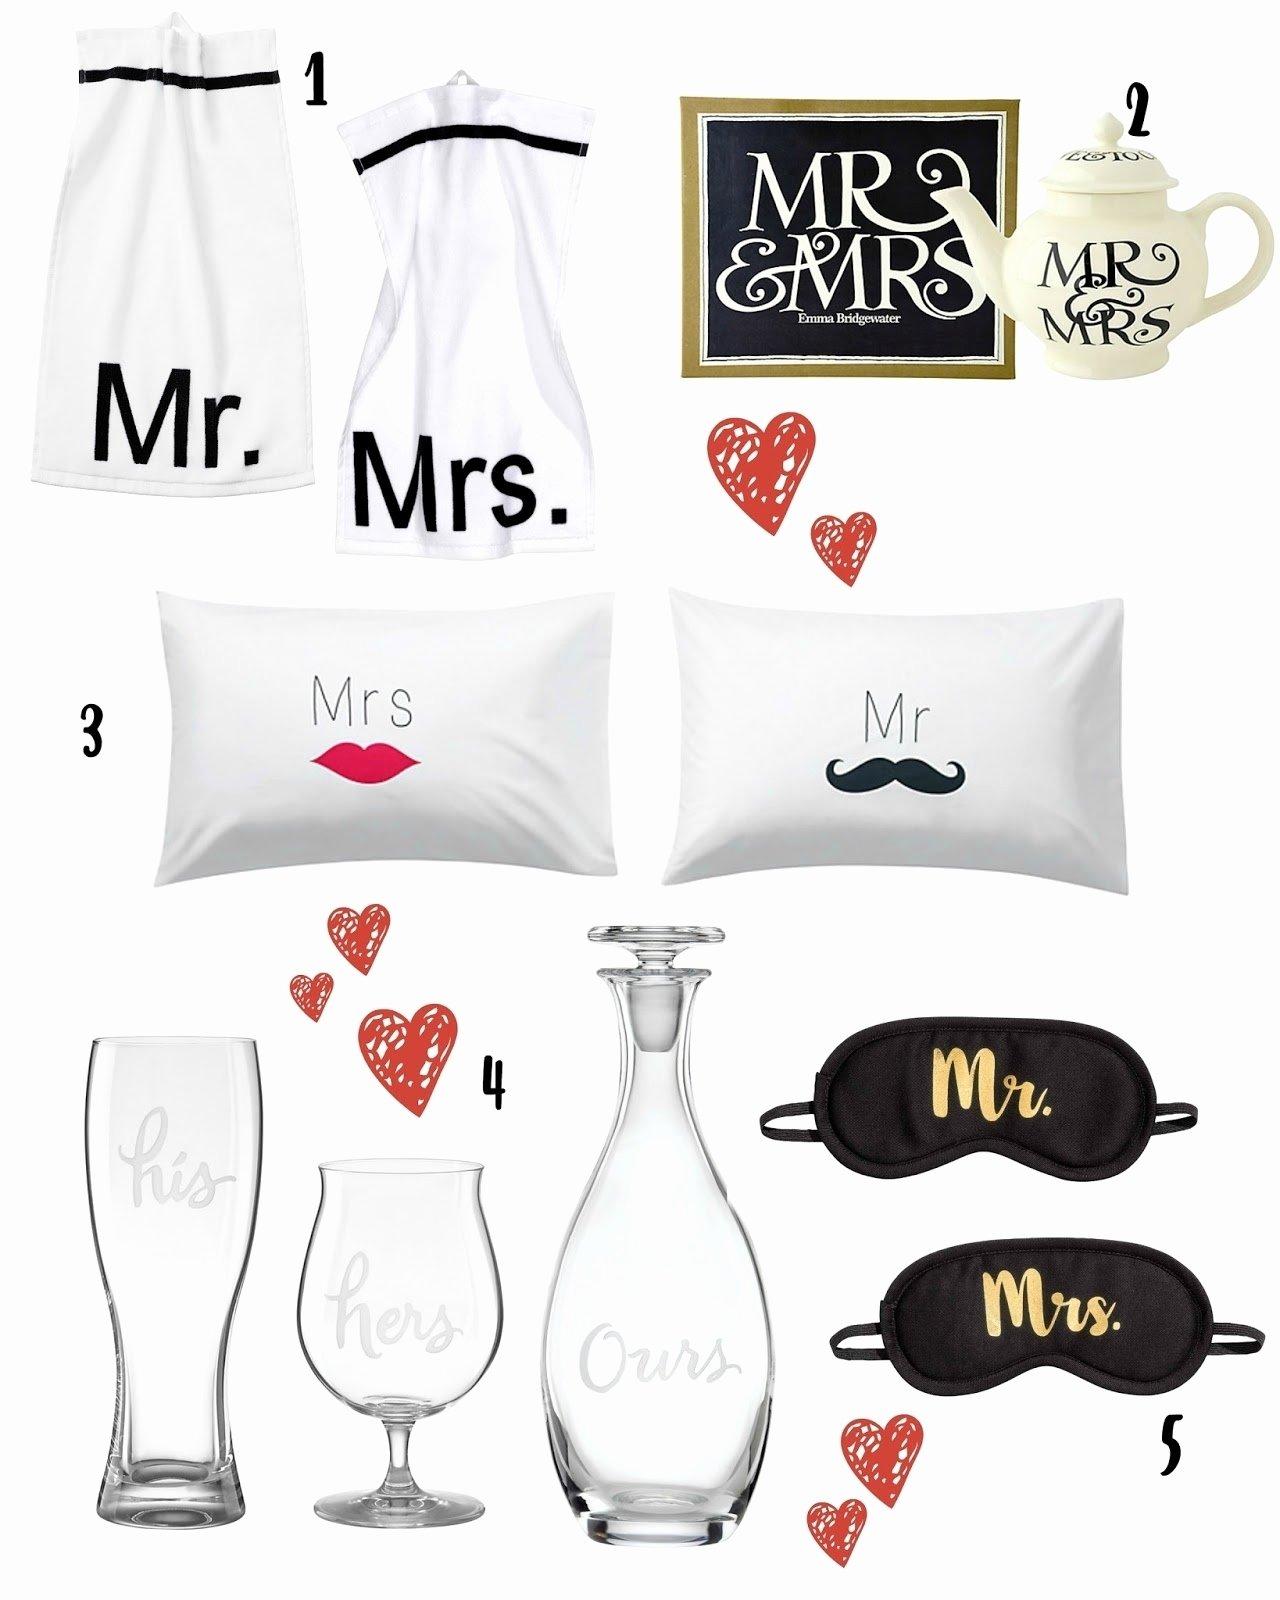 10 Lovable Last Minute Wedding Gift Ideas 2020